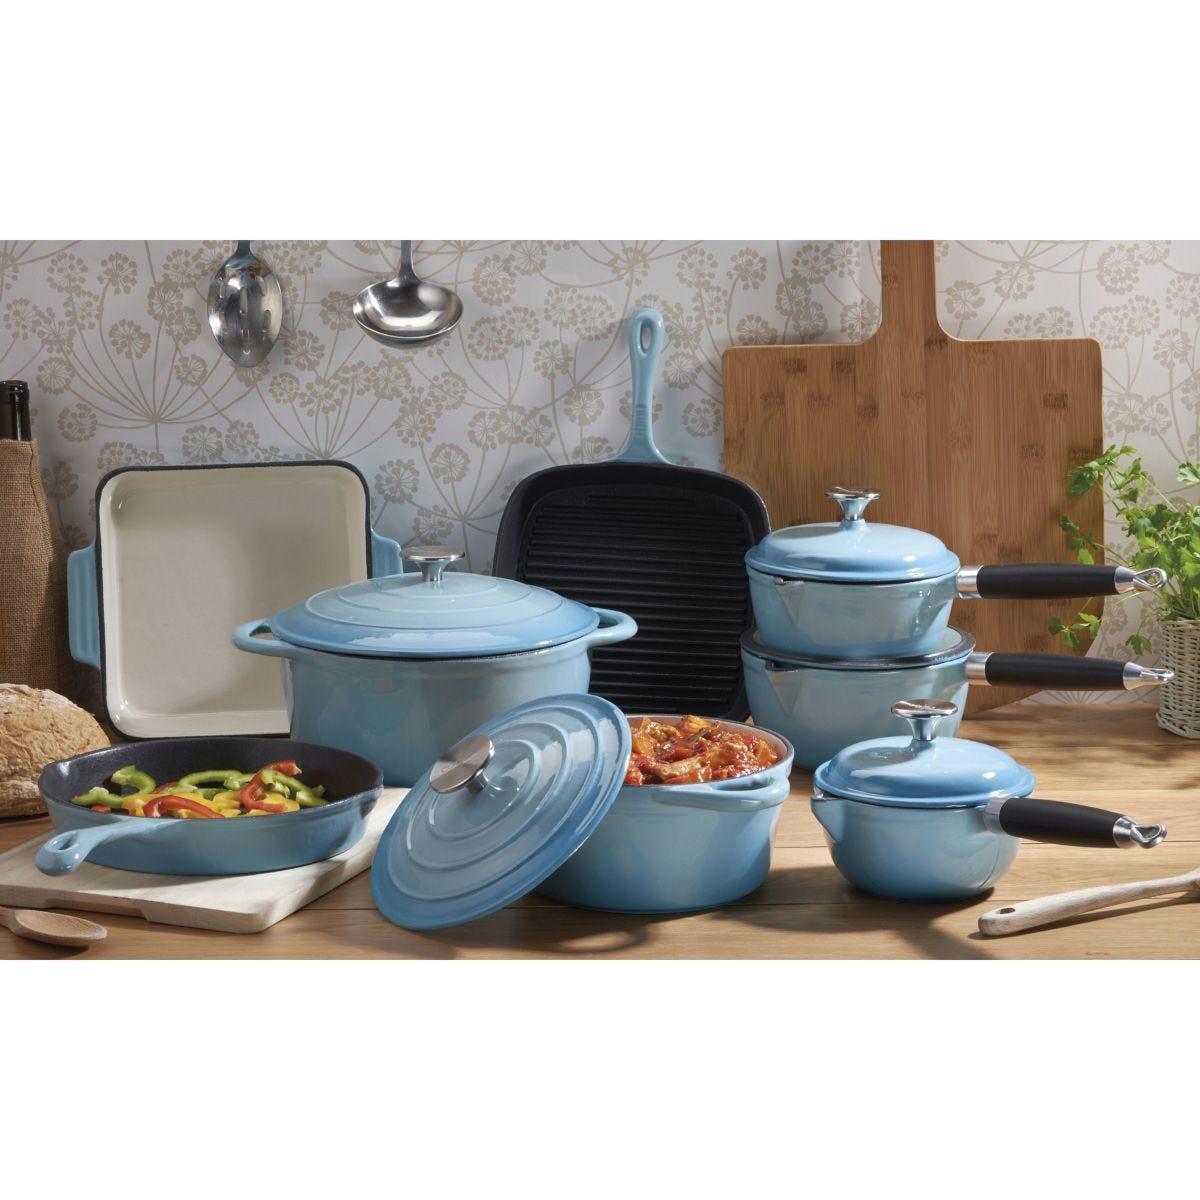 Cooks Professional Cast Iron 8pc Deluxe Pan Set - Blue